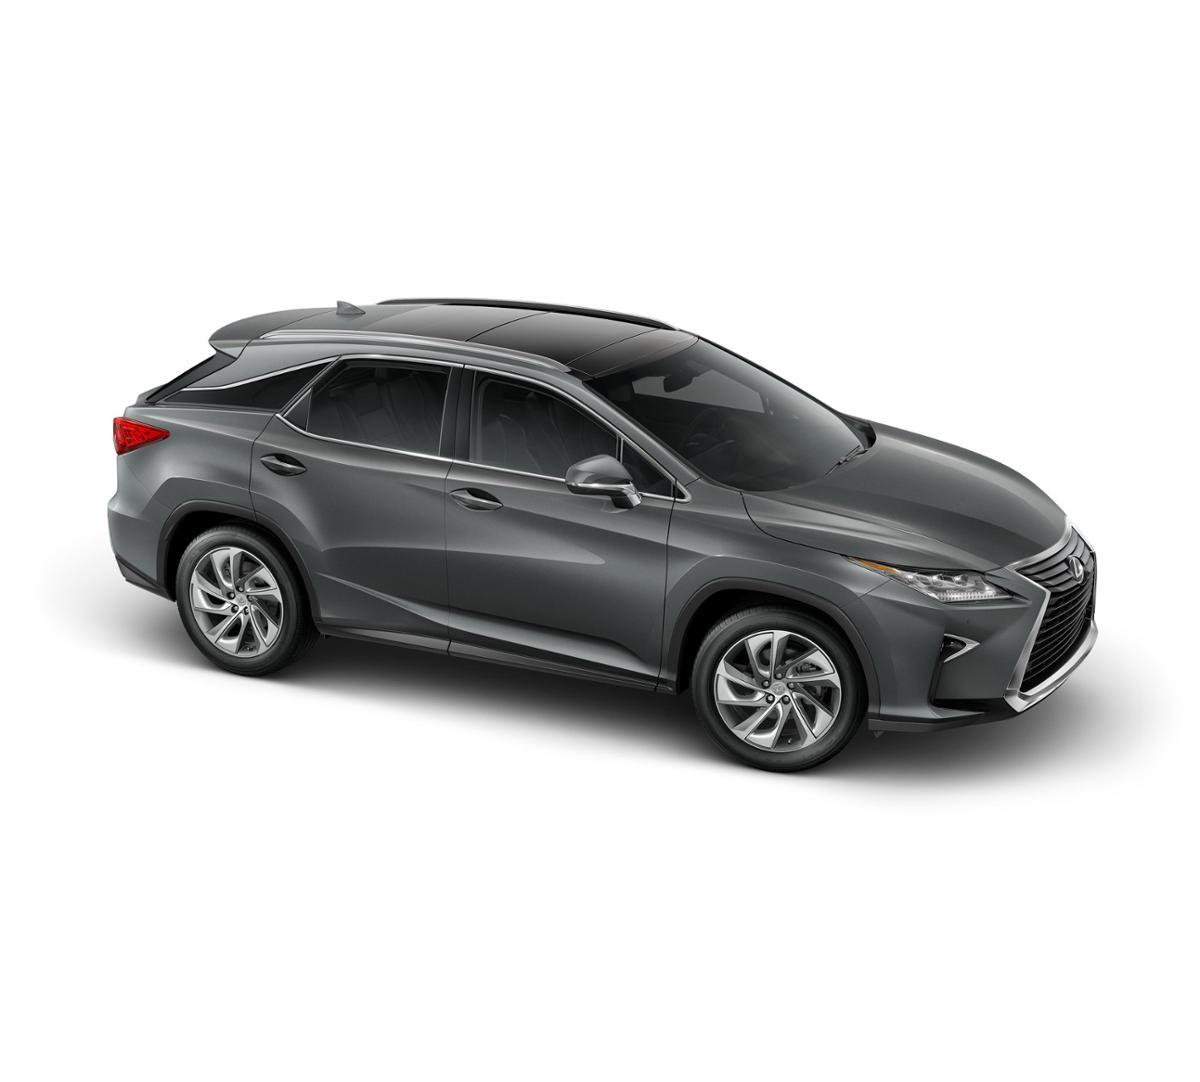 Lexus Rx350 Lease: New Nebula Gray Pearl 2019 Lexus RX 350 For Sale Fremont